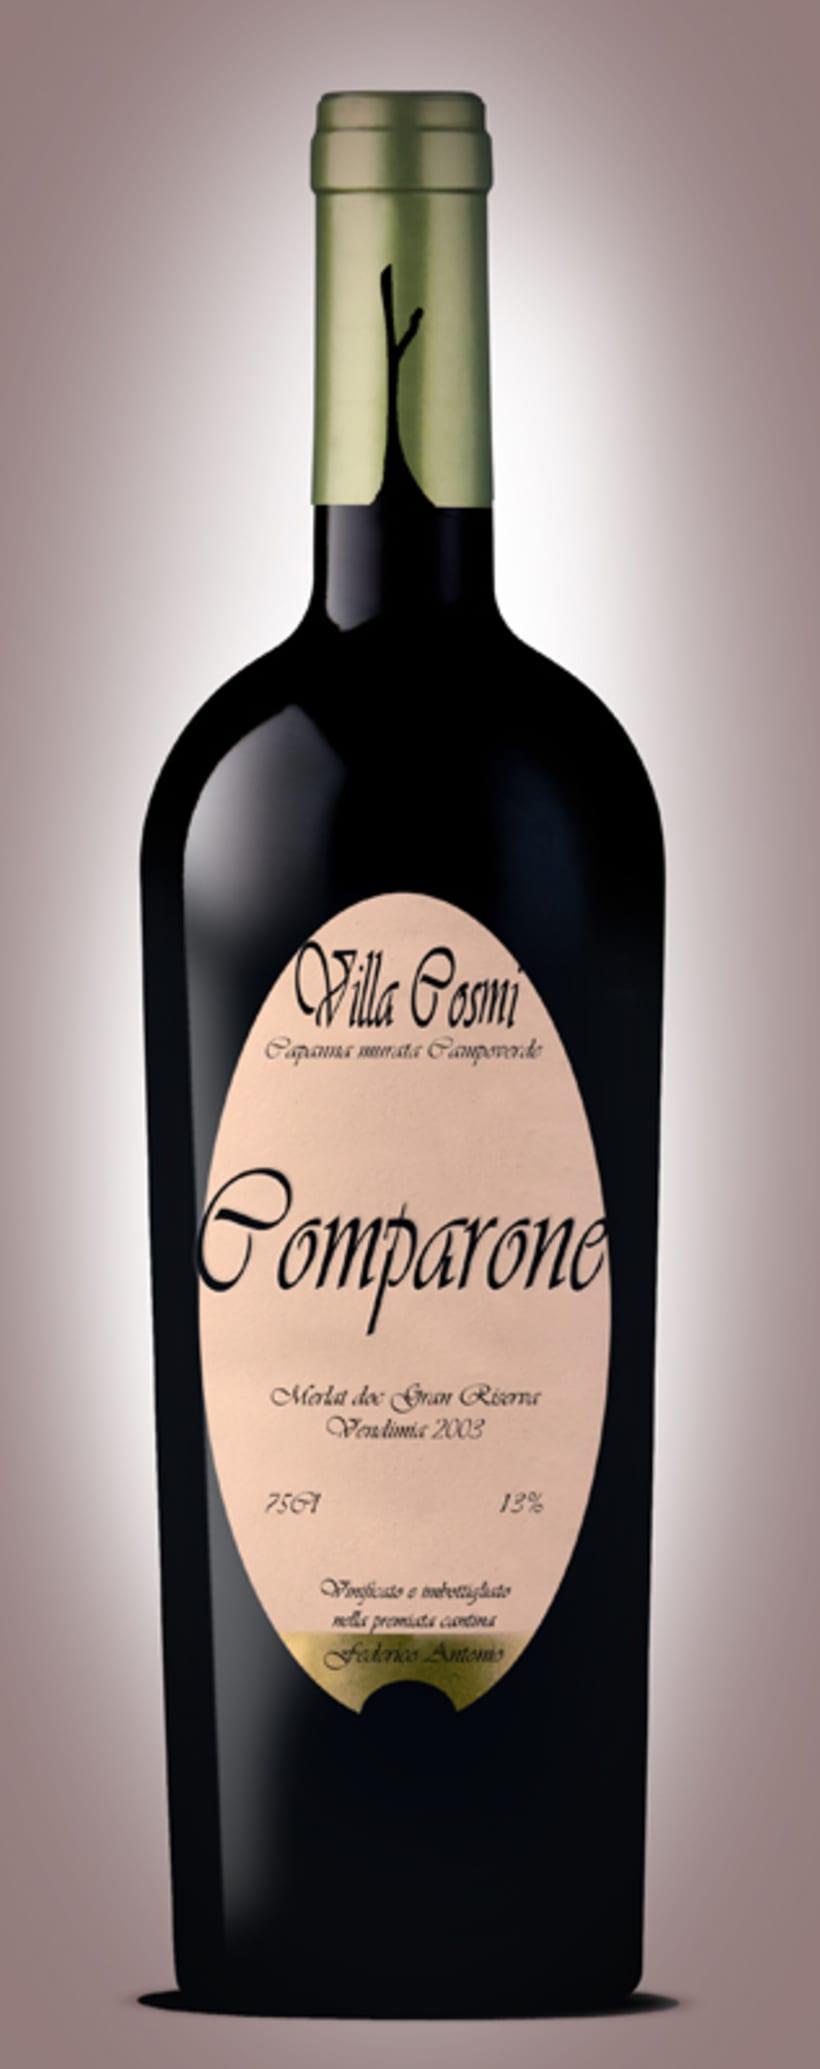 etiquetado vino tinto comparone 1